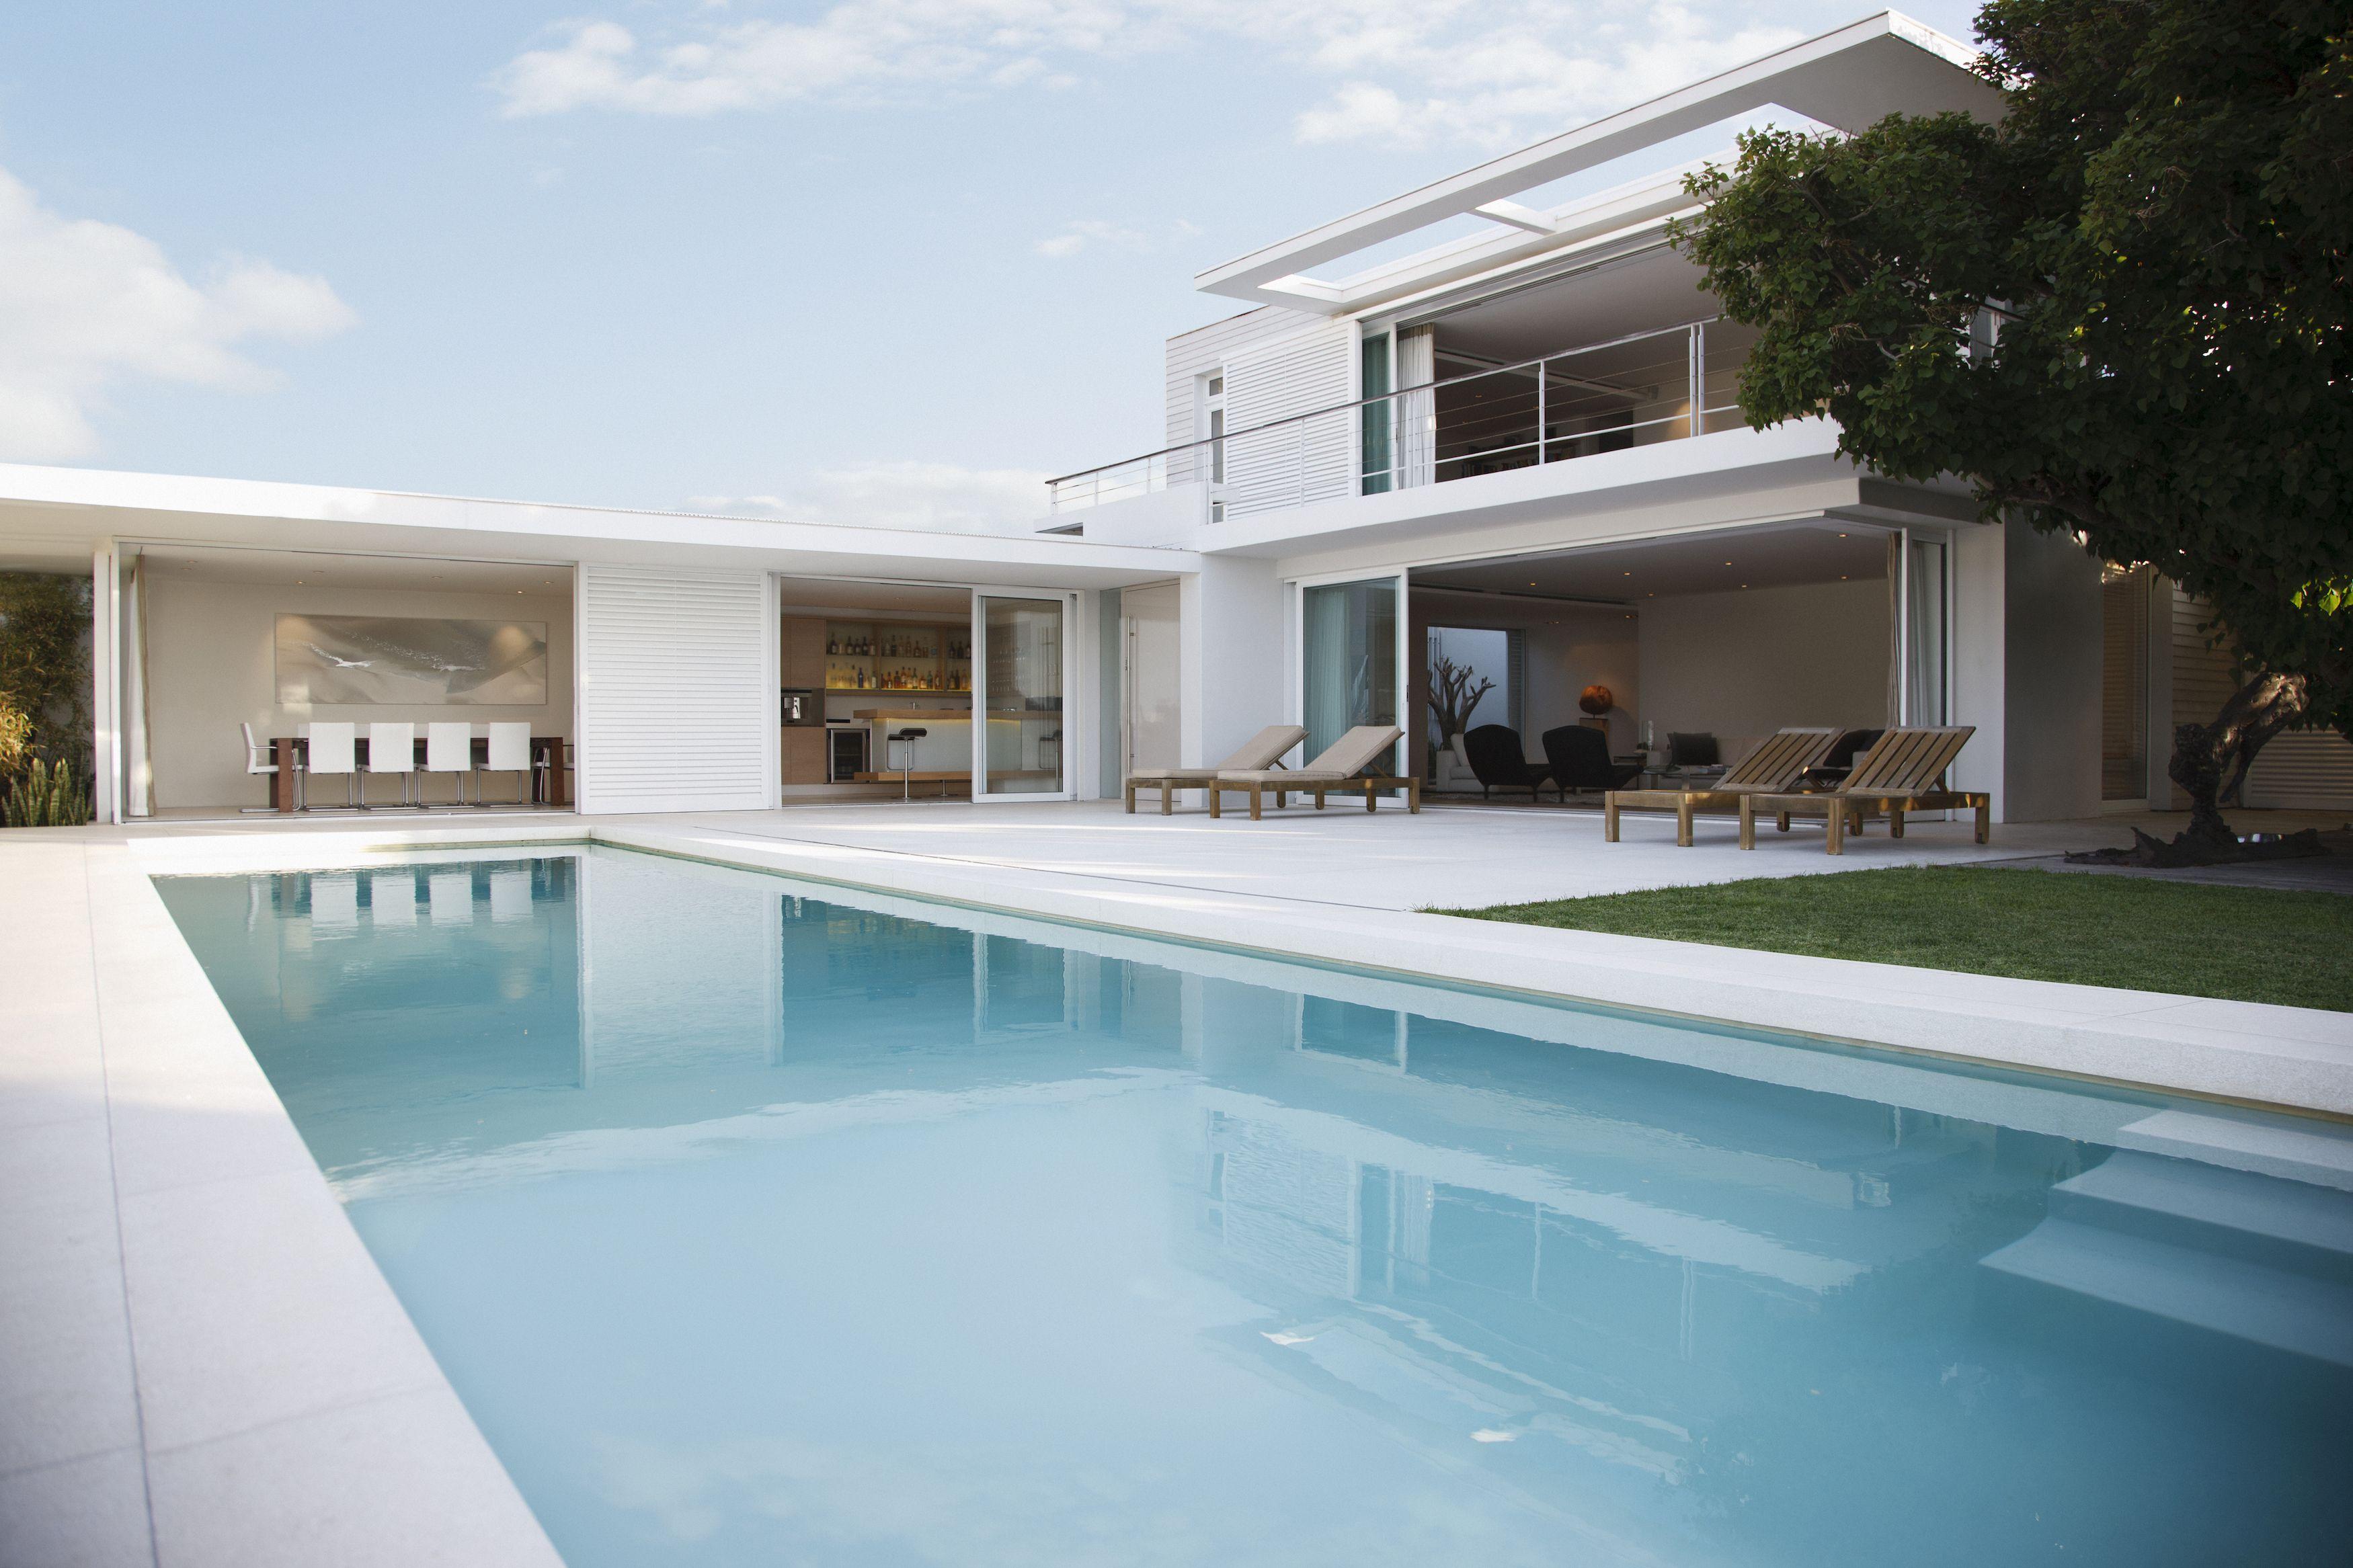 Pool Deck Ideas Design Tips